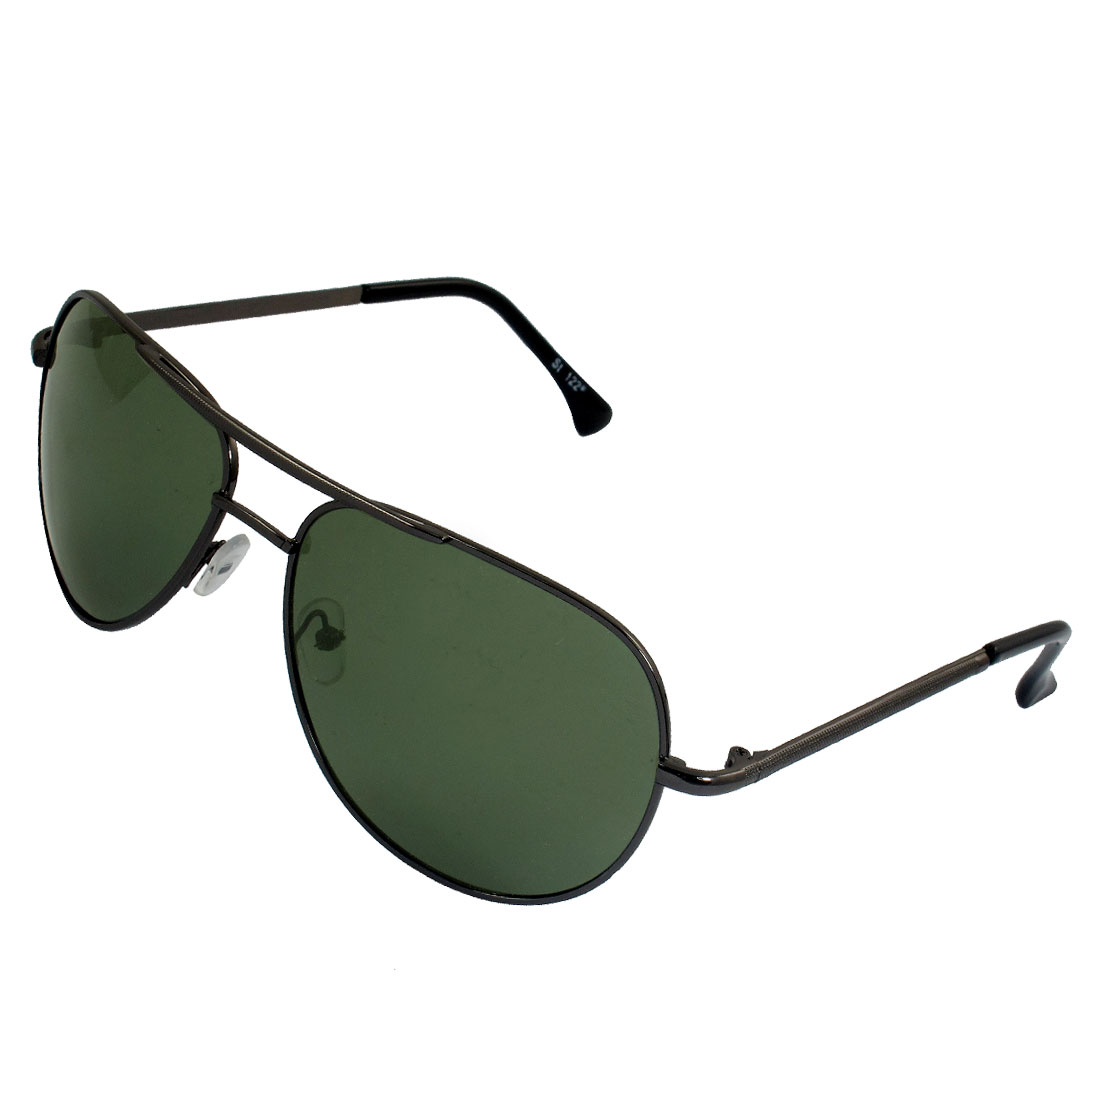 Men Dark Gray Textured Plastic Tip Arms Double Bridge Polarized Sunglasses